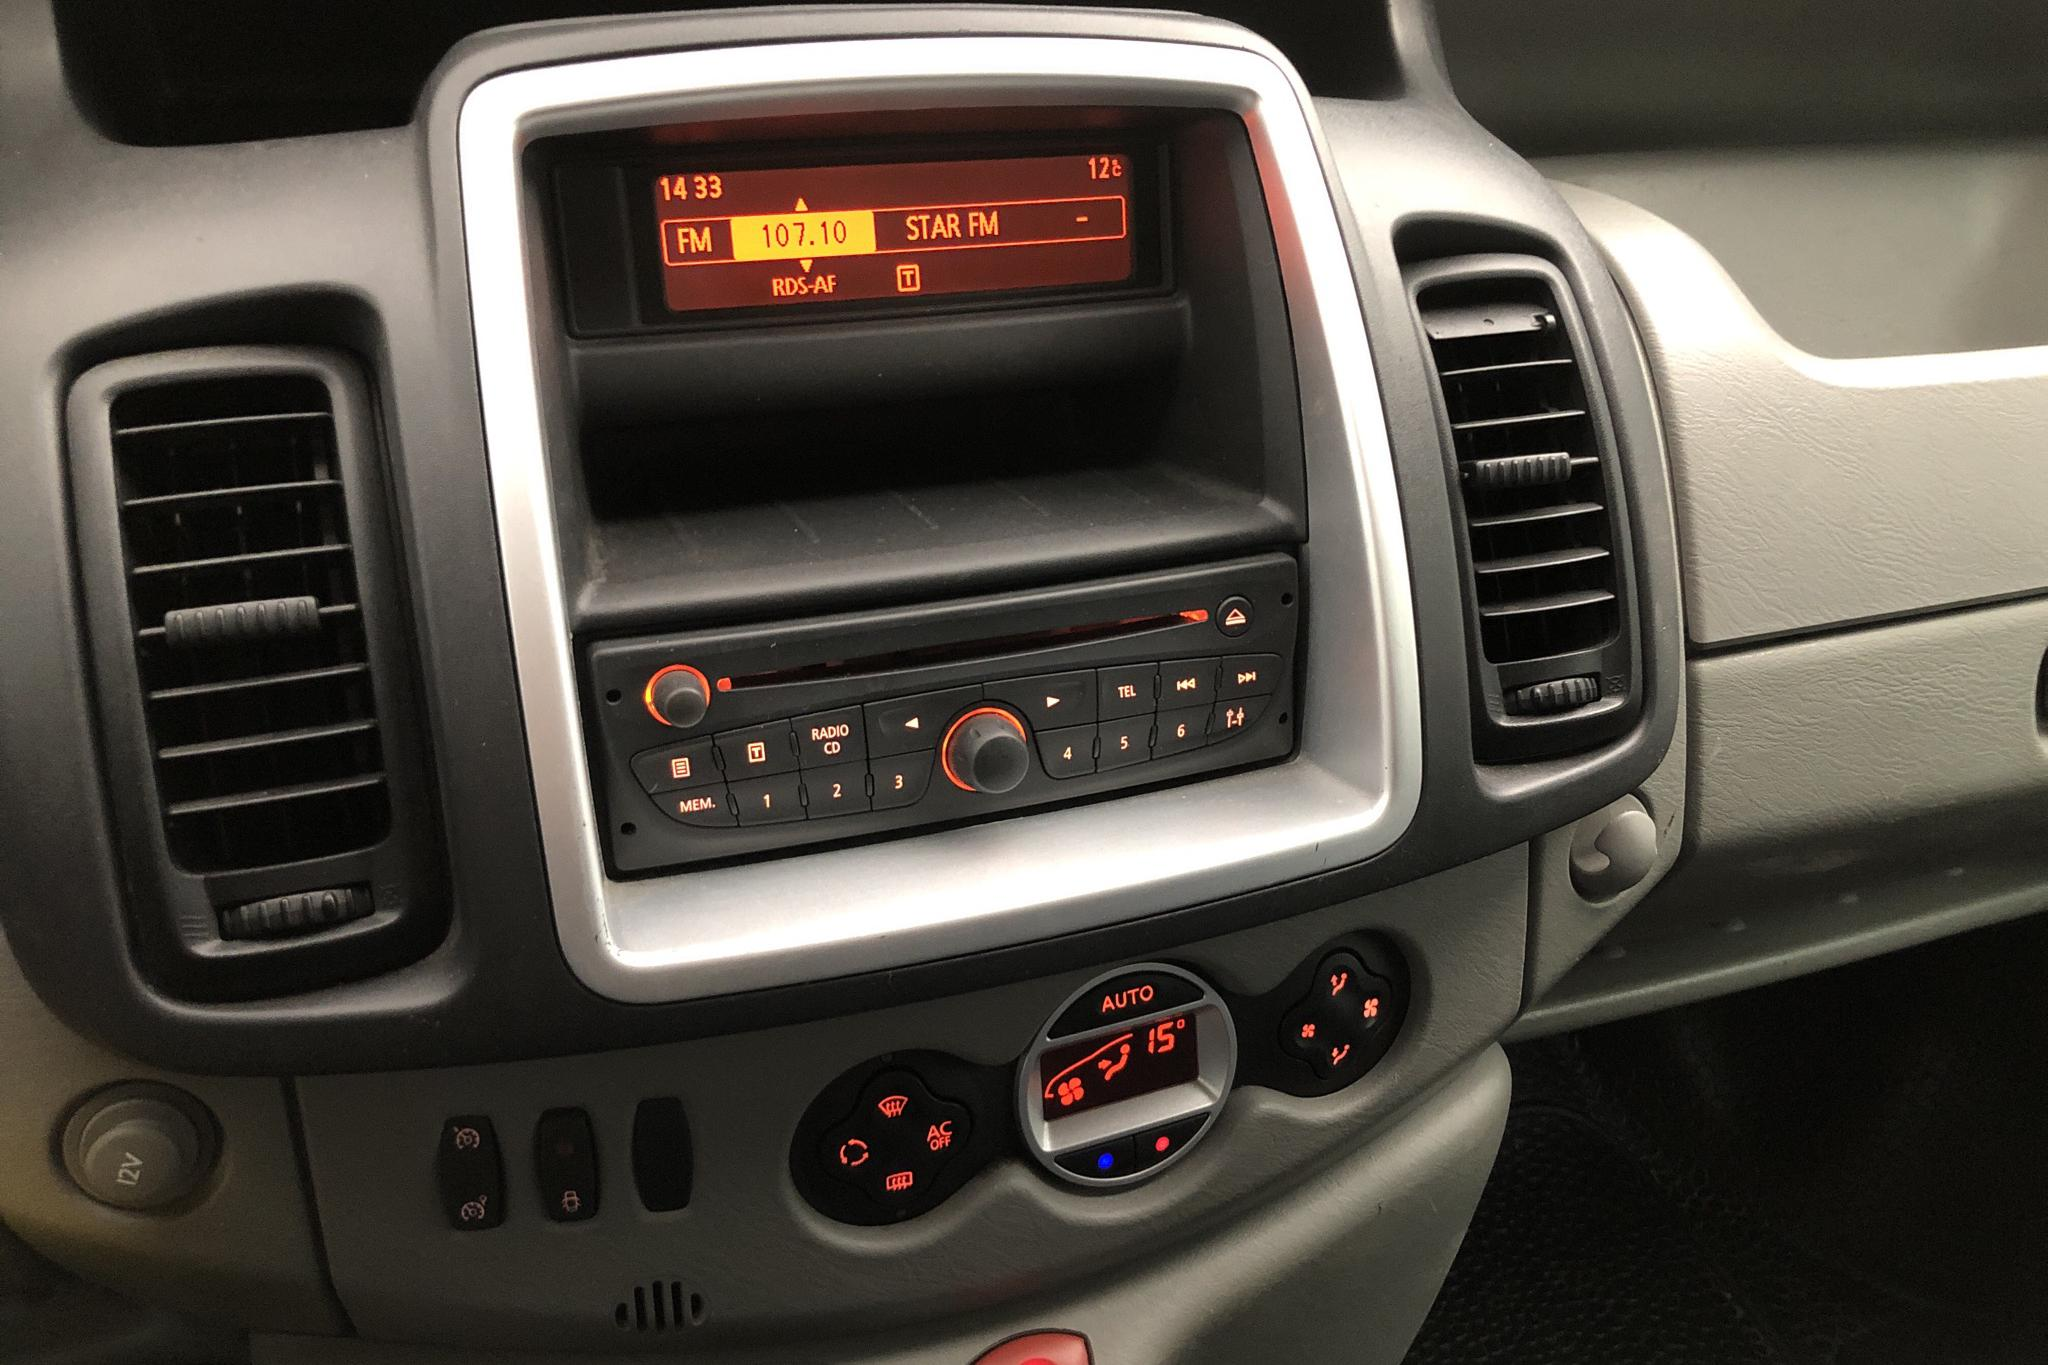 Renault Trafic 2.0 dCi Skåp (115hk) - 0 km - Manual - white - 2014